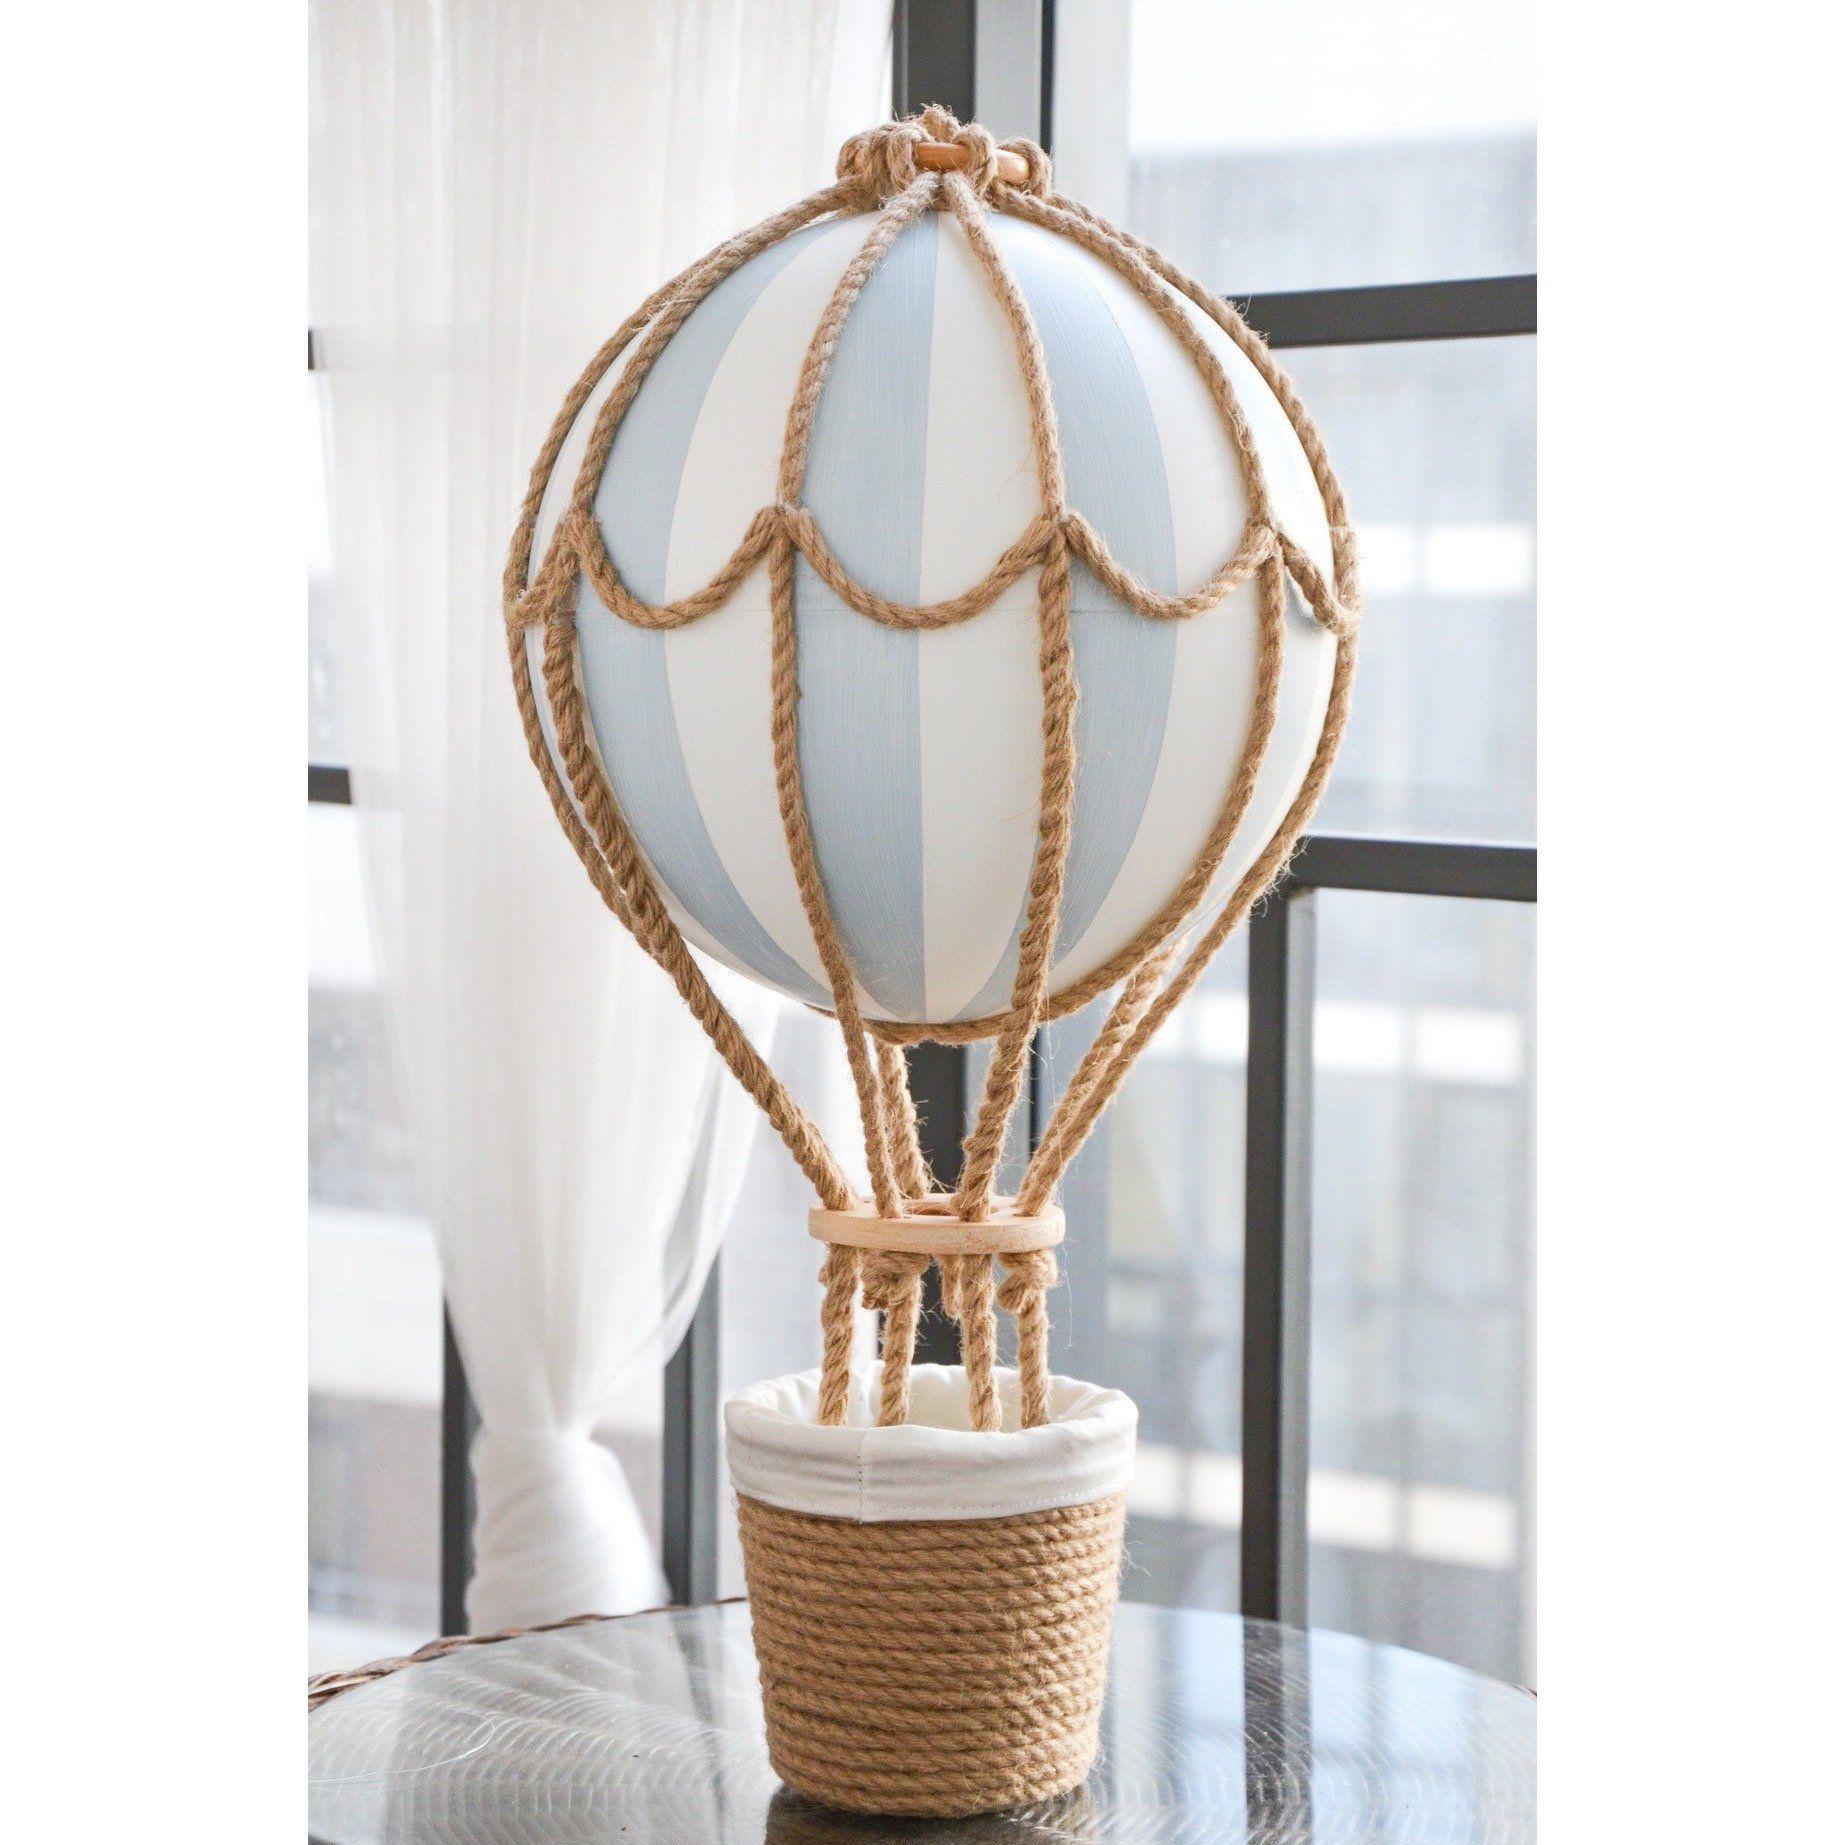 Hot Air Balloon Medium Centerpiece, Travel Nursery Decor